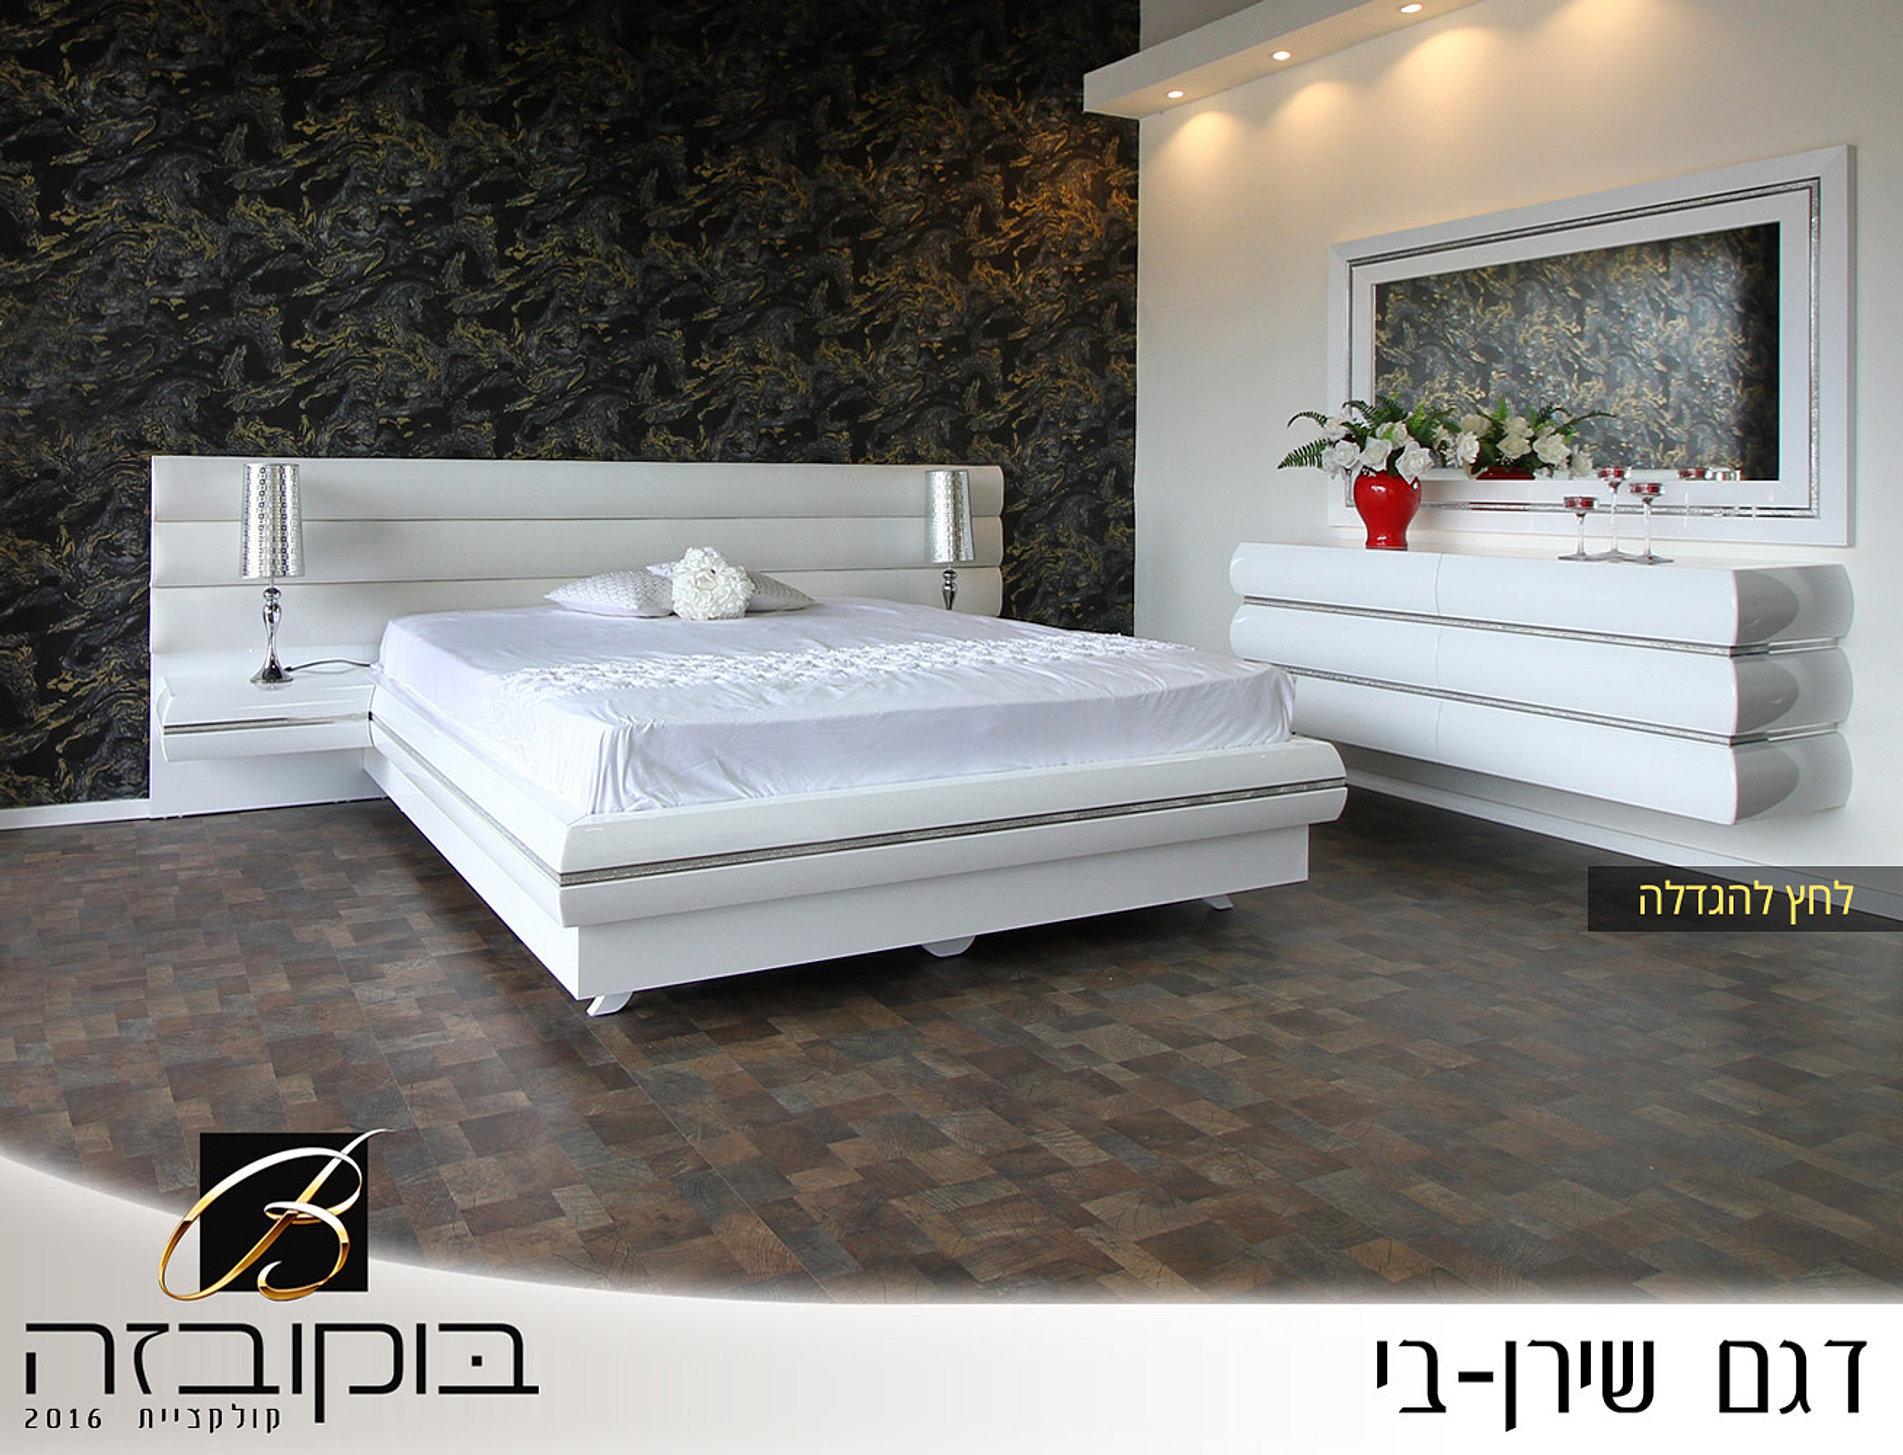 Furniture For Bedrooms חדרי שינה הורים חדרי שינה מעוצבים בוקובזה רהיטים